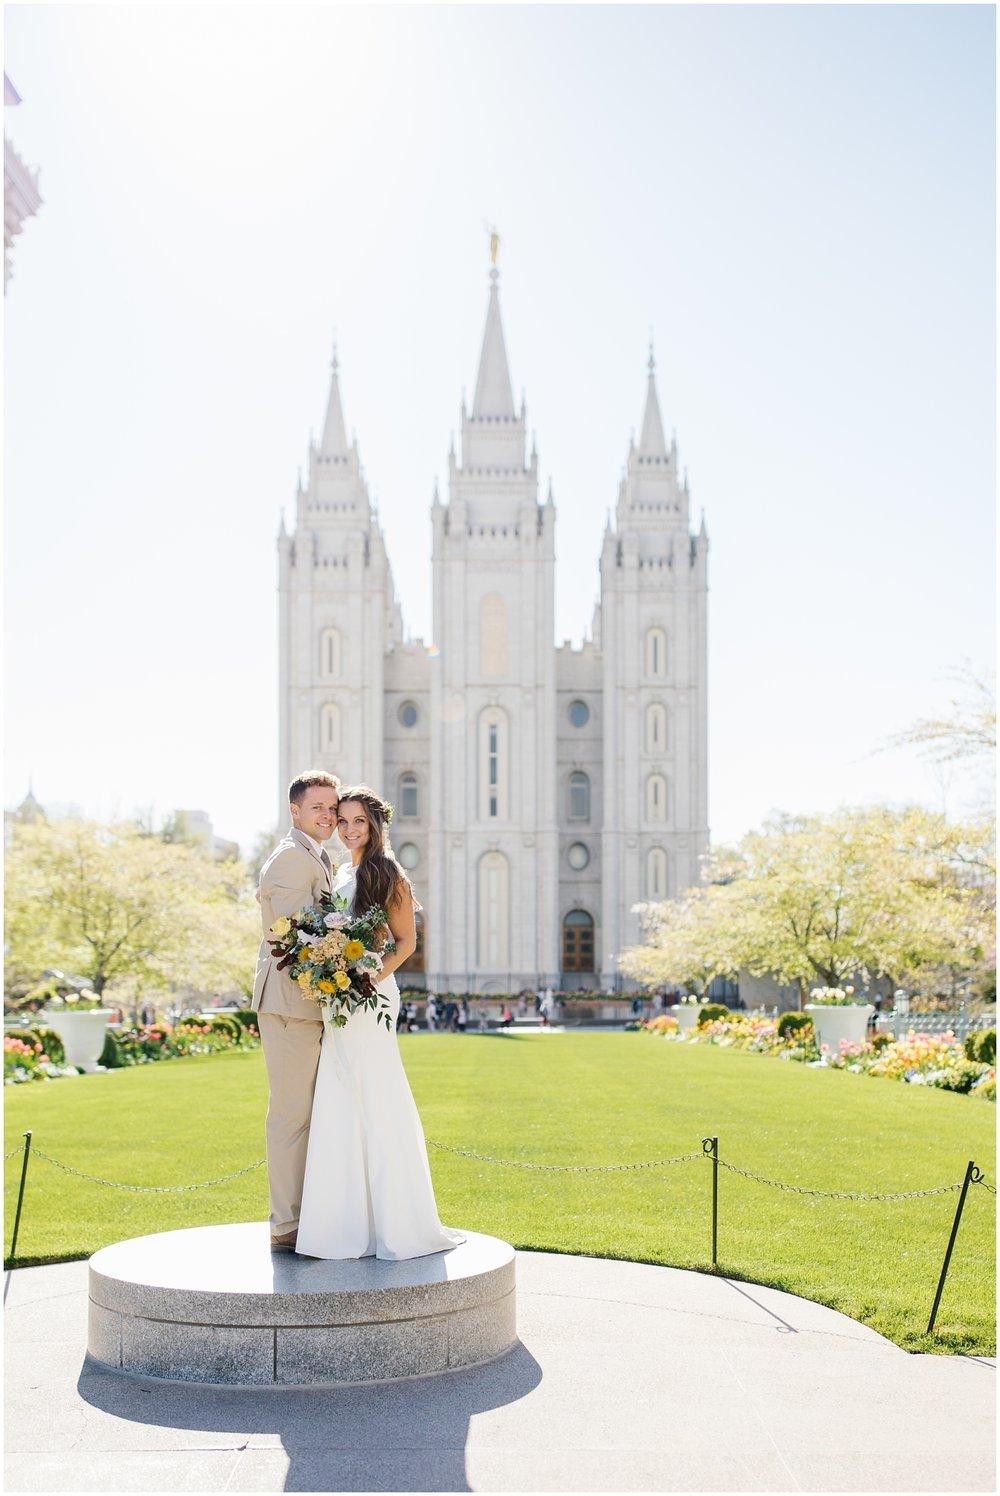 JC-Wedding-221_Lizzie-B-Imagery-Utah-Wedding-Photographer-Park-City-Salt-Lake-City-Temple-Joseph-Smith-Memorial-Building-Empire-Room.jpg